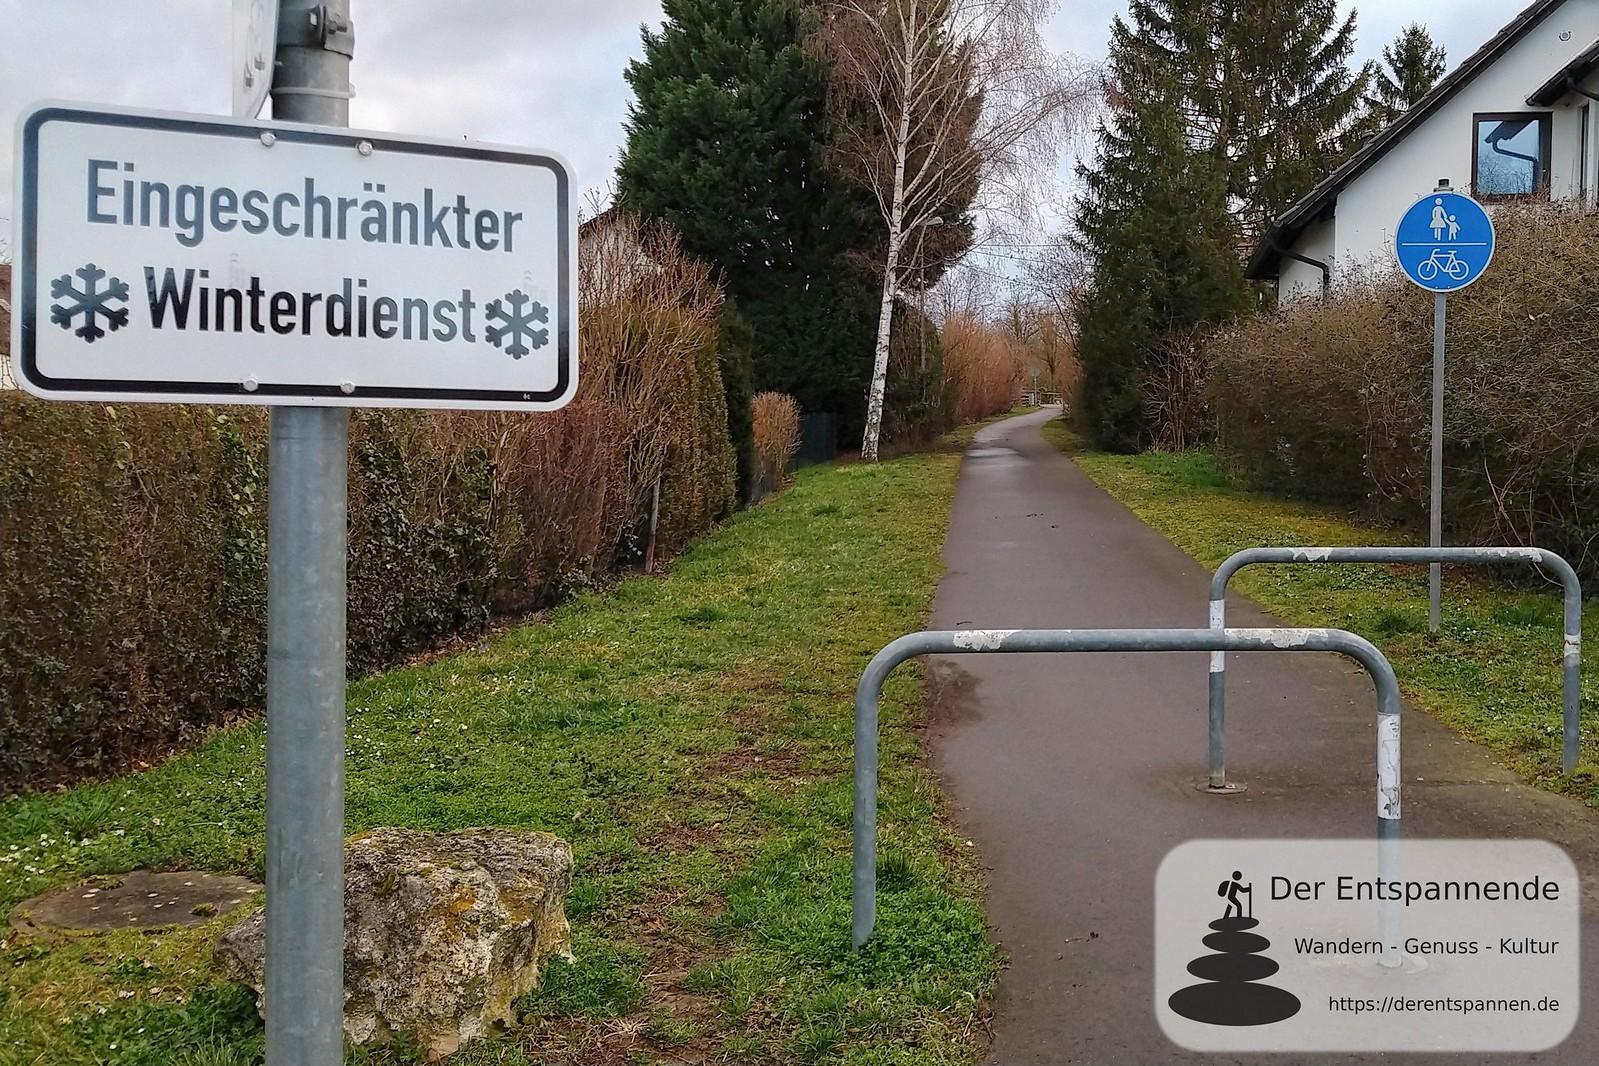 Radweg in Selzen (K 37, Bahnhofstr.), ehemalige Bahnstrecke Alzey-Bodenheim (Amiche)